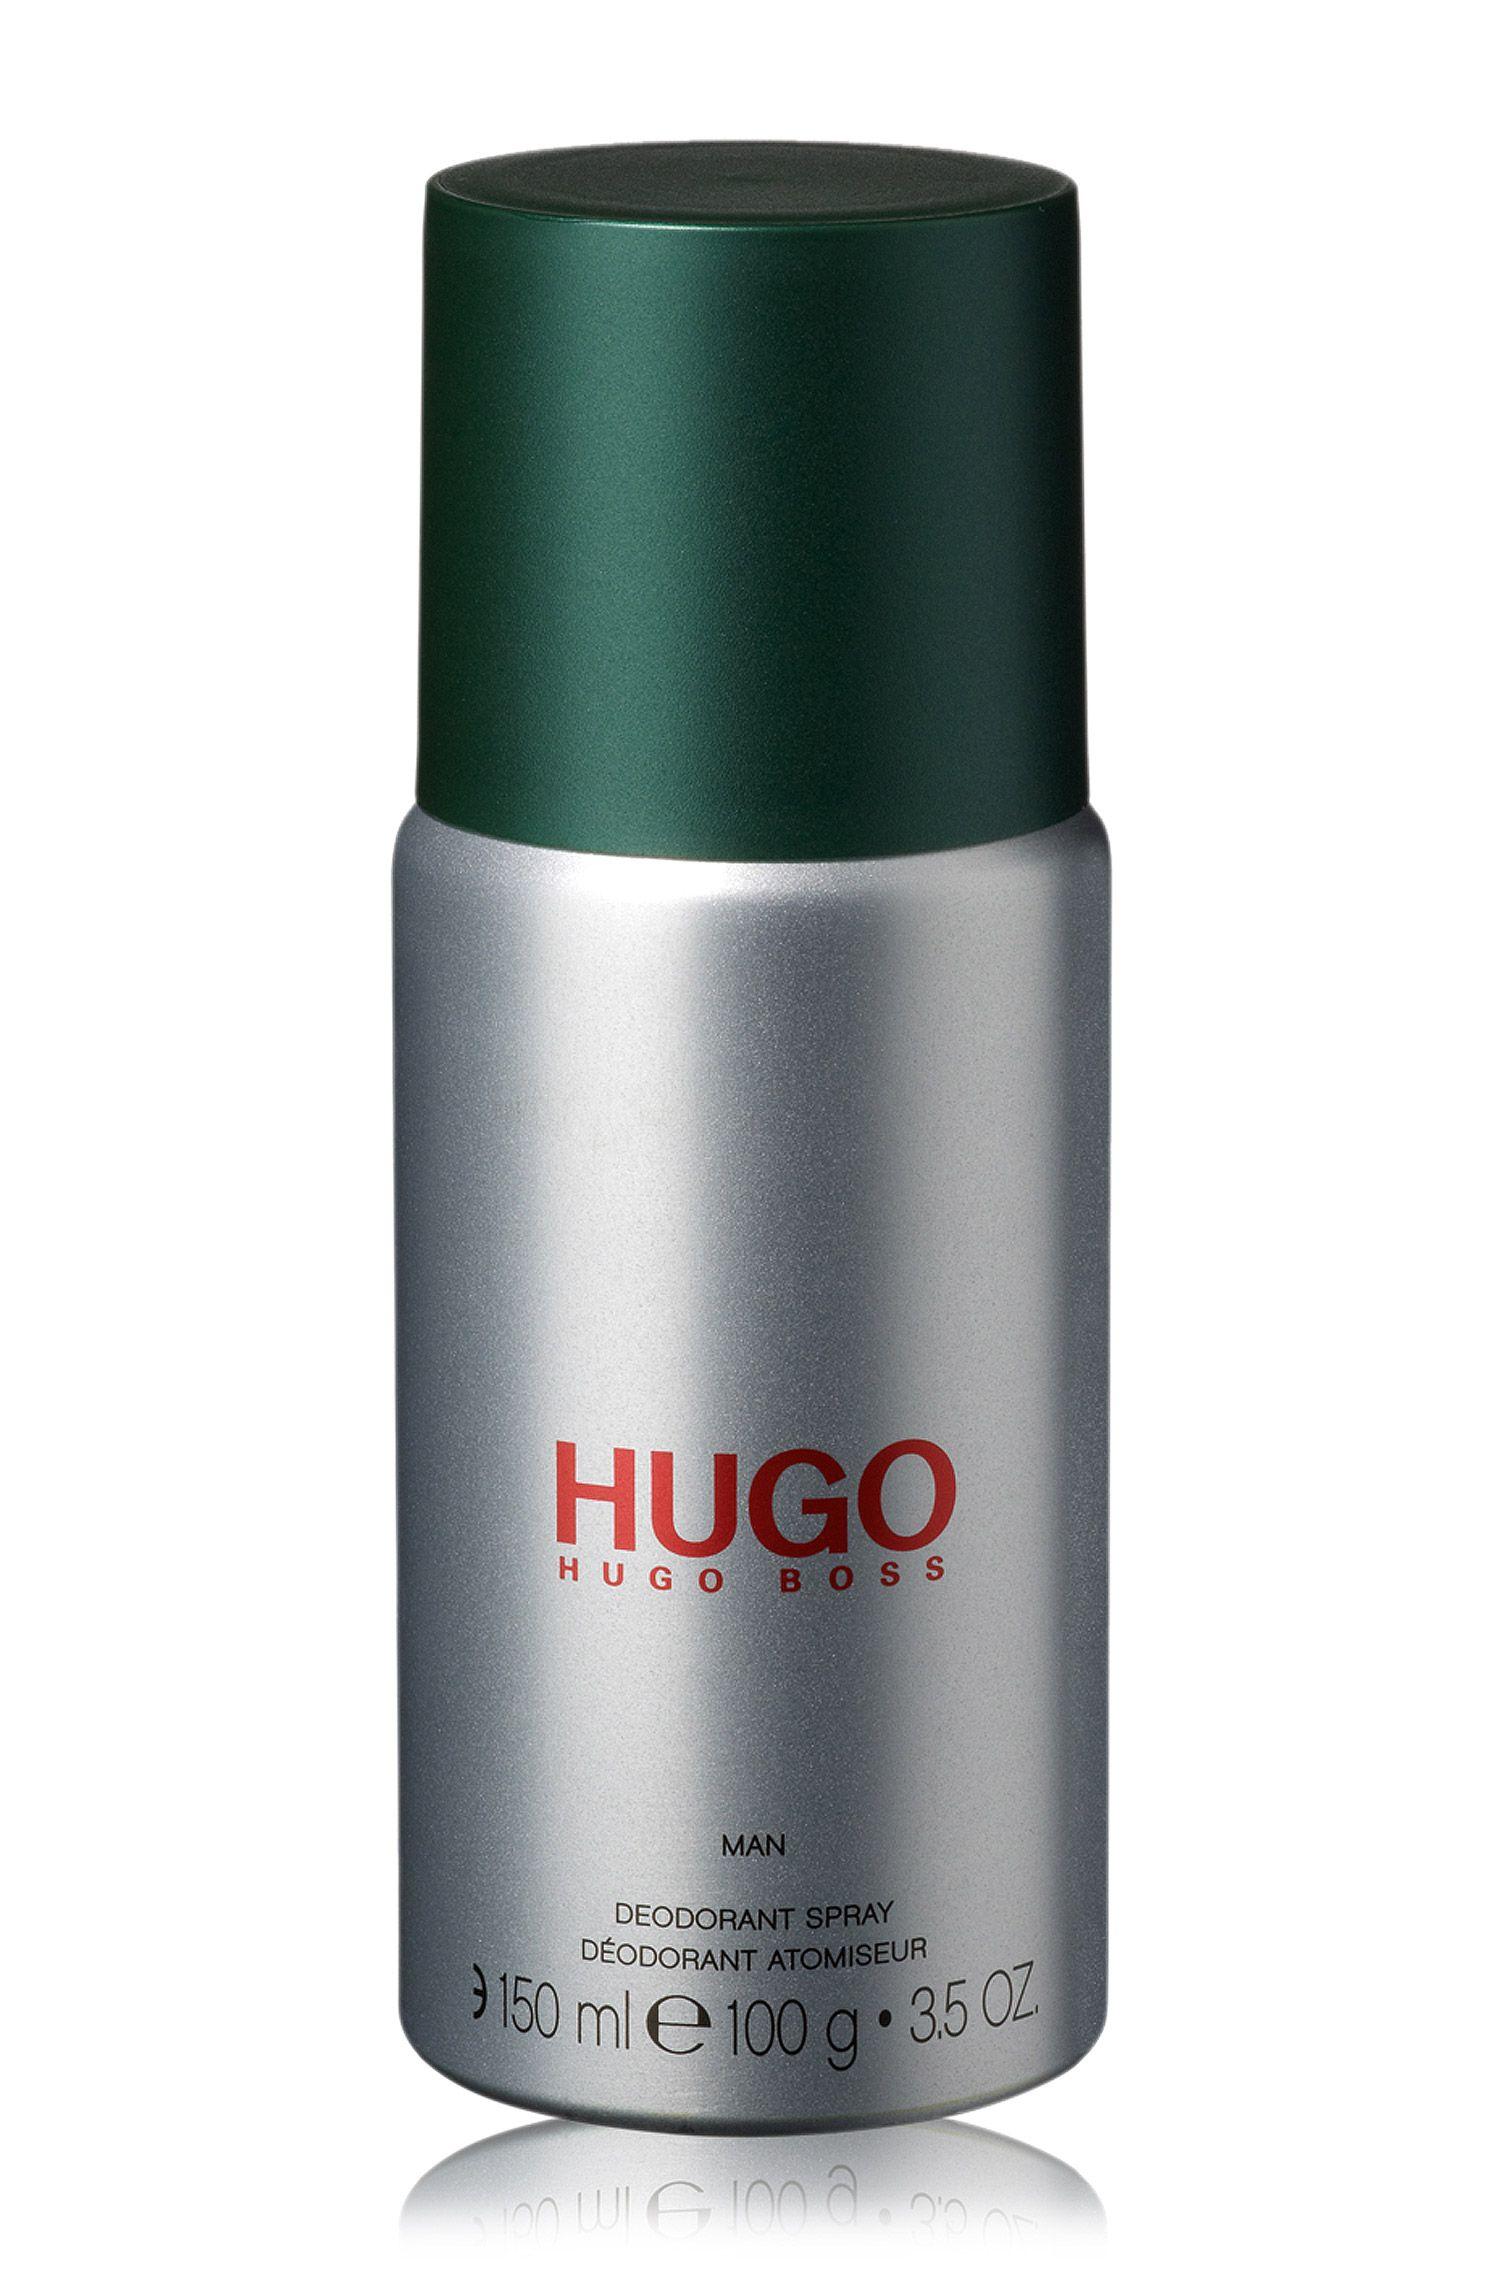 'HUGO Man' Deospray